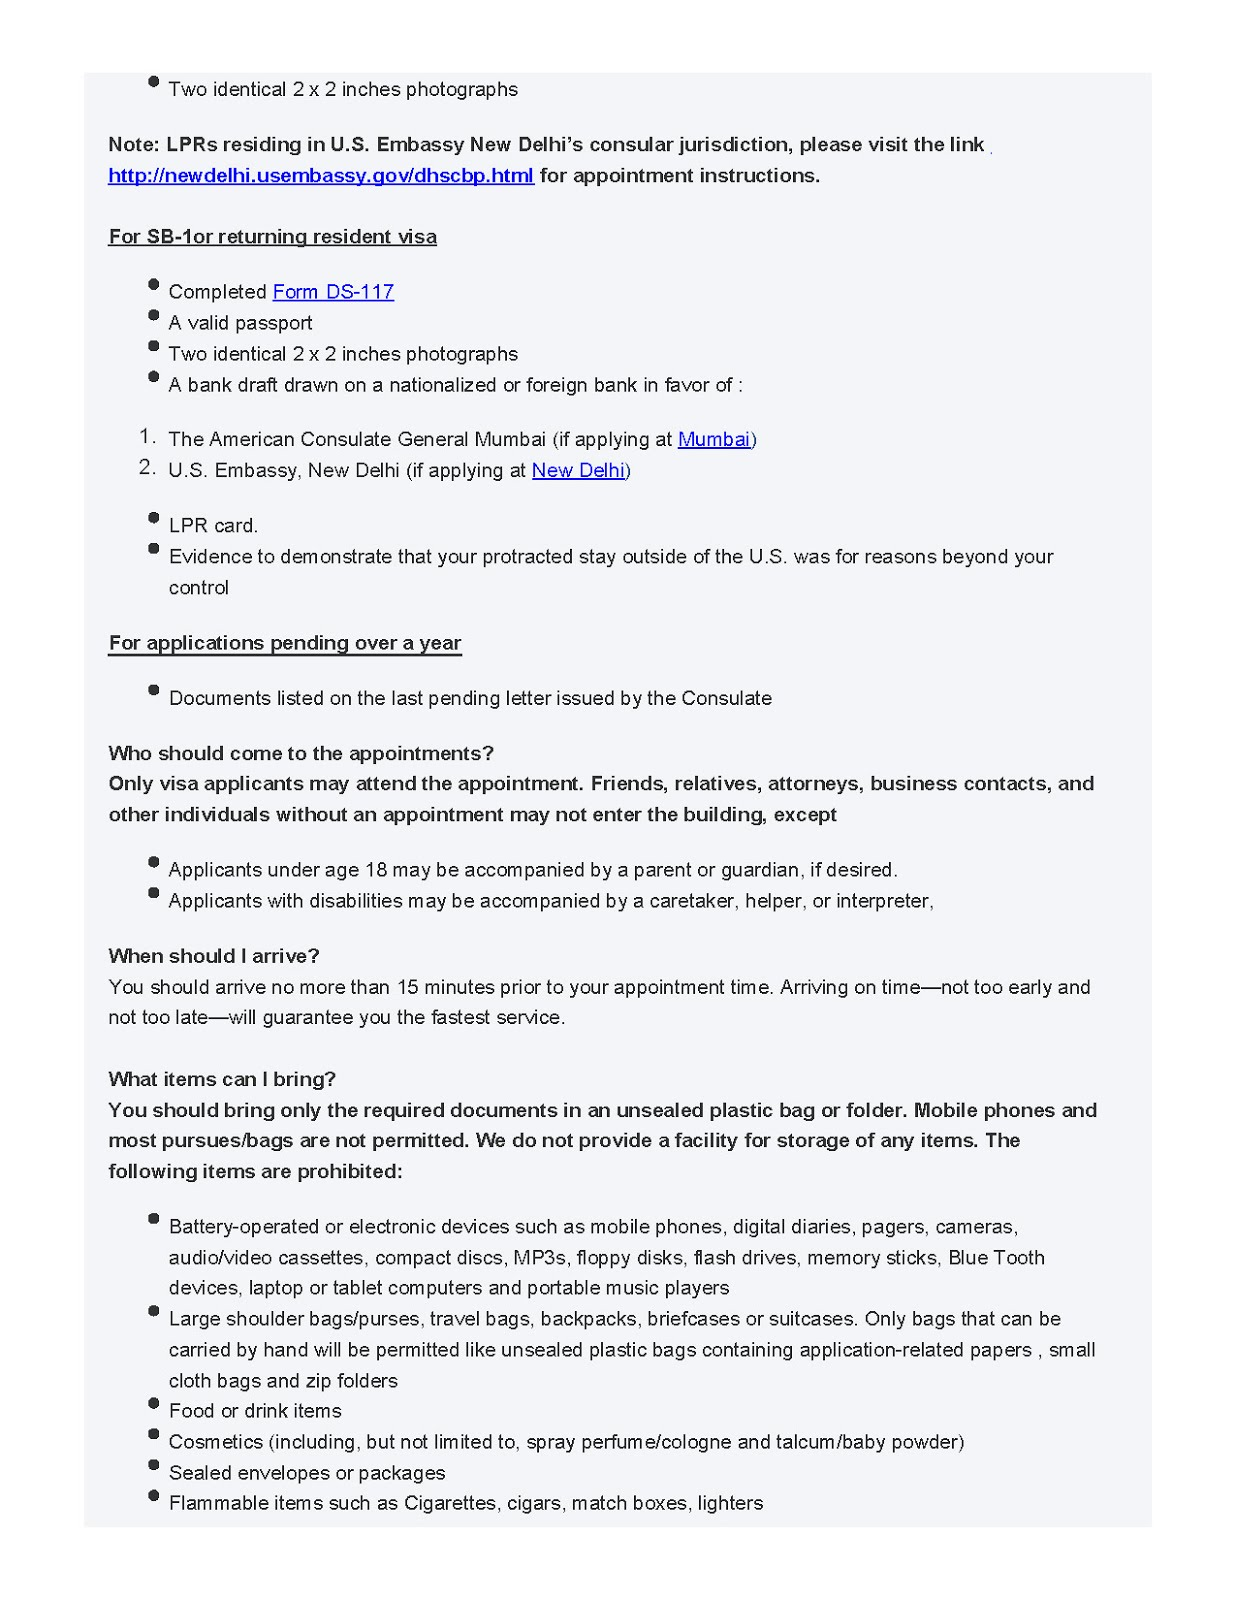 India visa application form Download singapore visa